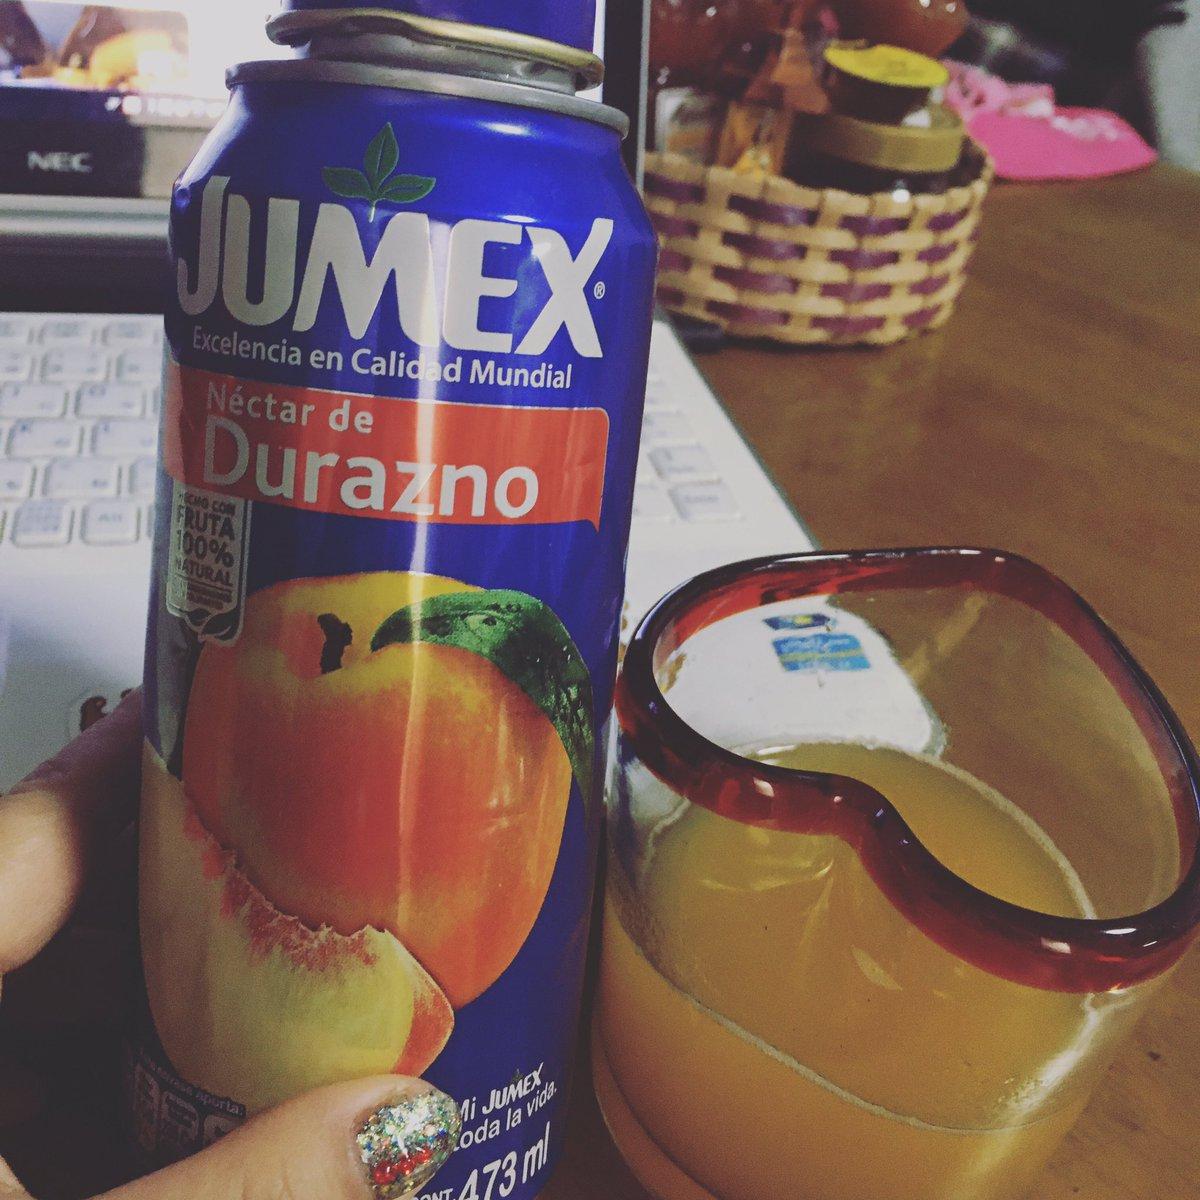 JUMEXうまうま  #saboroso #durazno  #hechoenmexicopic.twitter.com/WmmmoEDGJ1